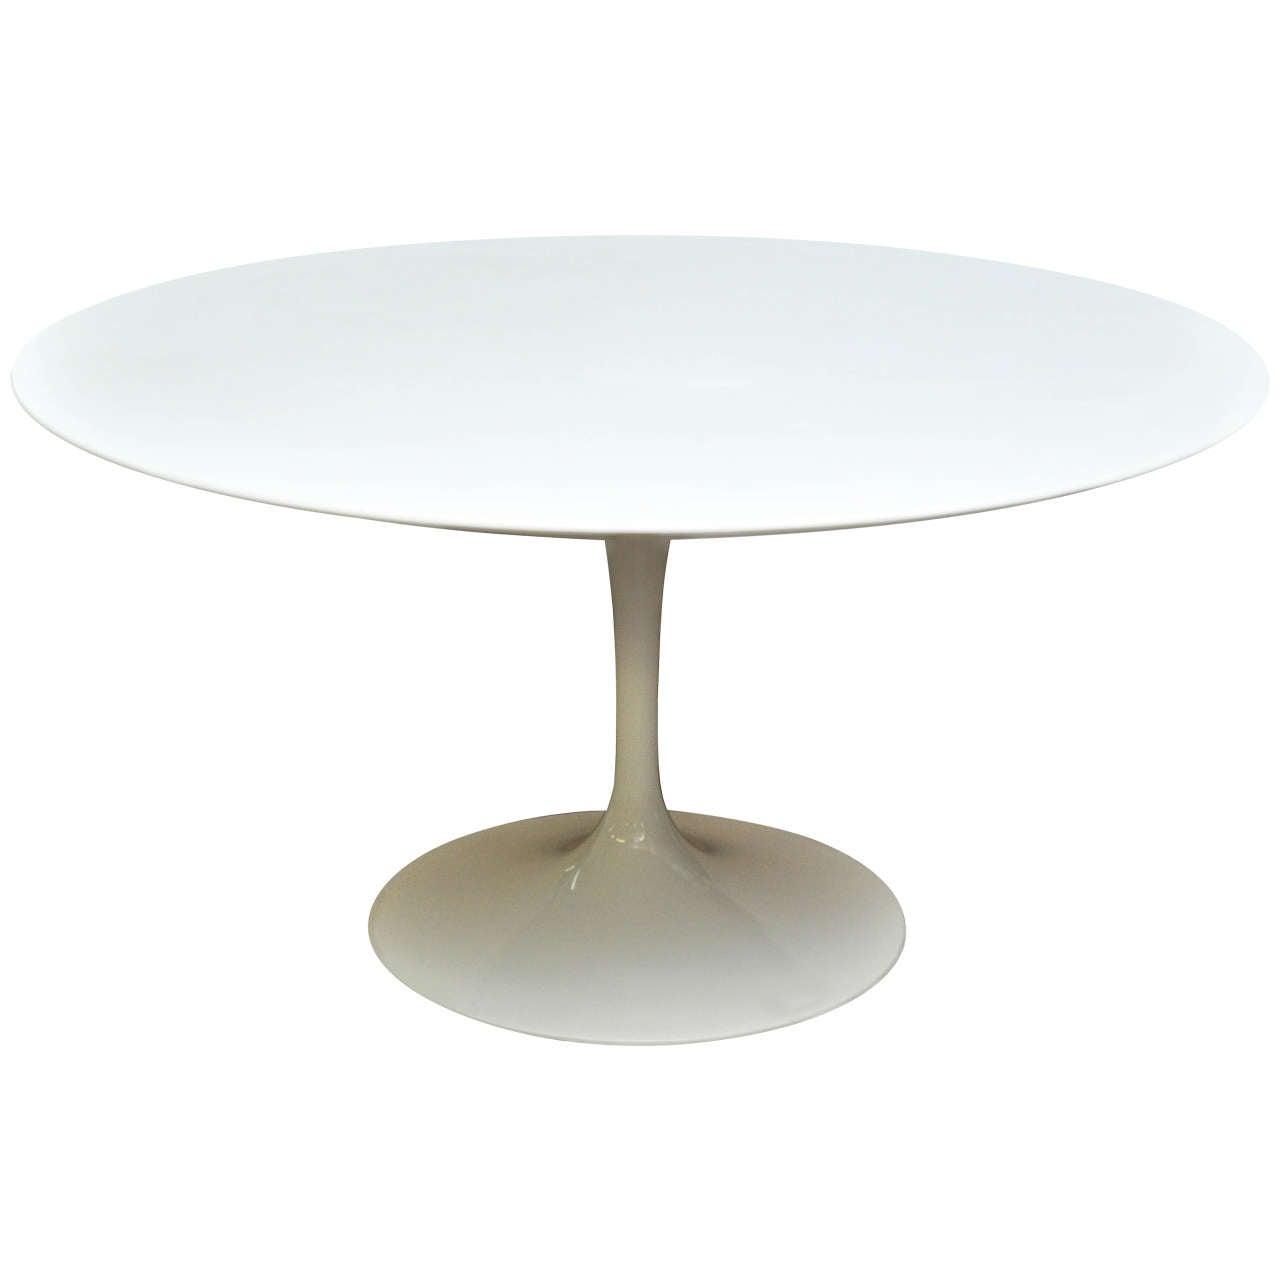 knoll saarinen dining table for sale at 1stdibs. Black Bedroom Furniture Sets. Home Design Ideas